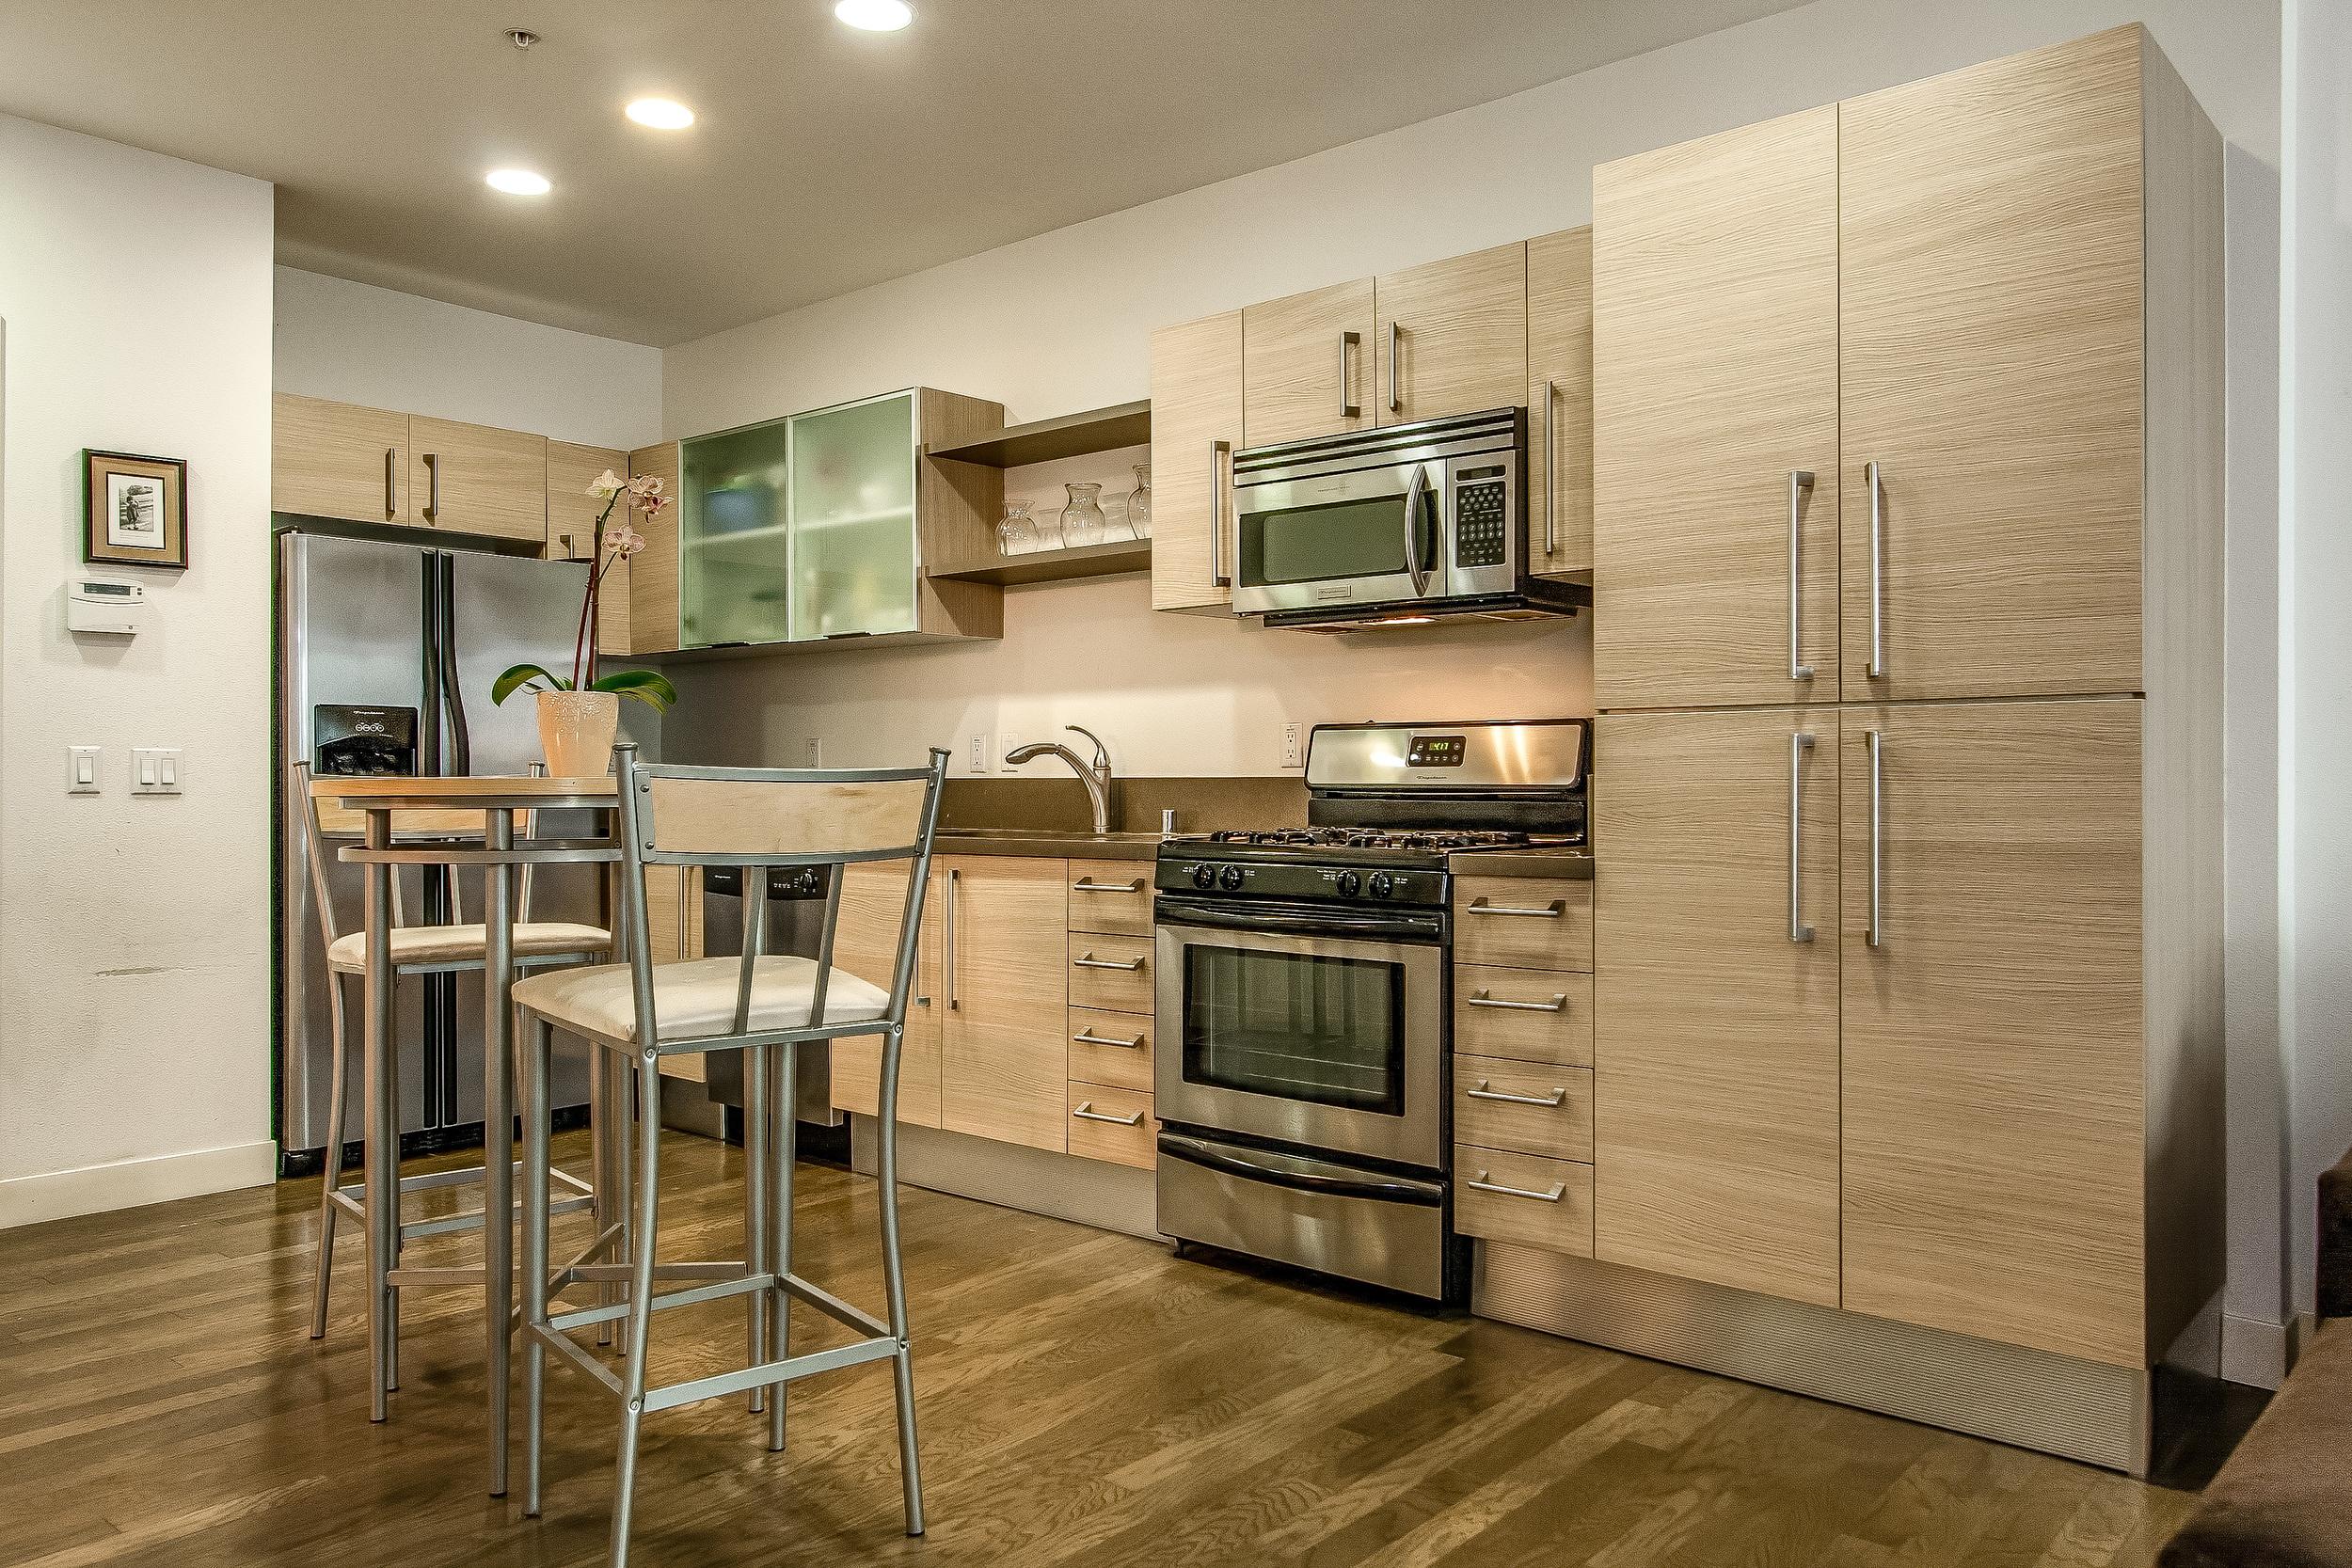 005-Kitchen-637009-large.jpg